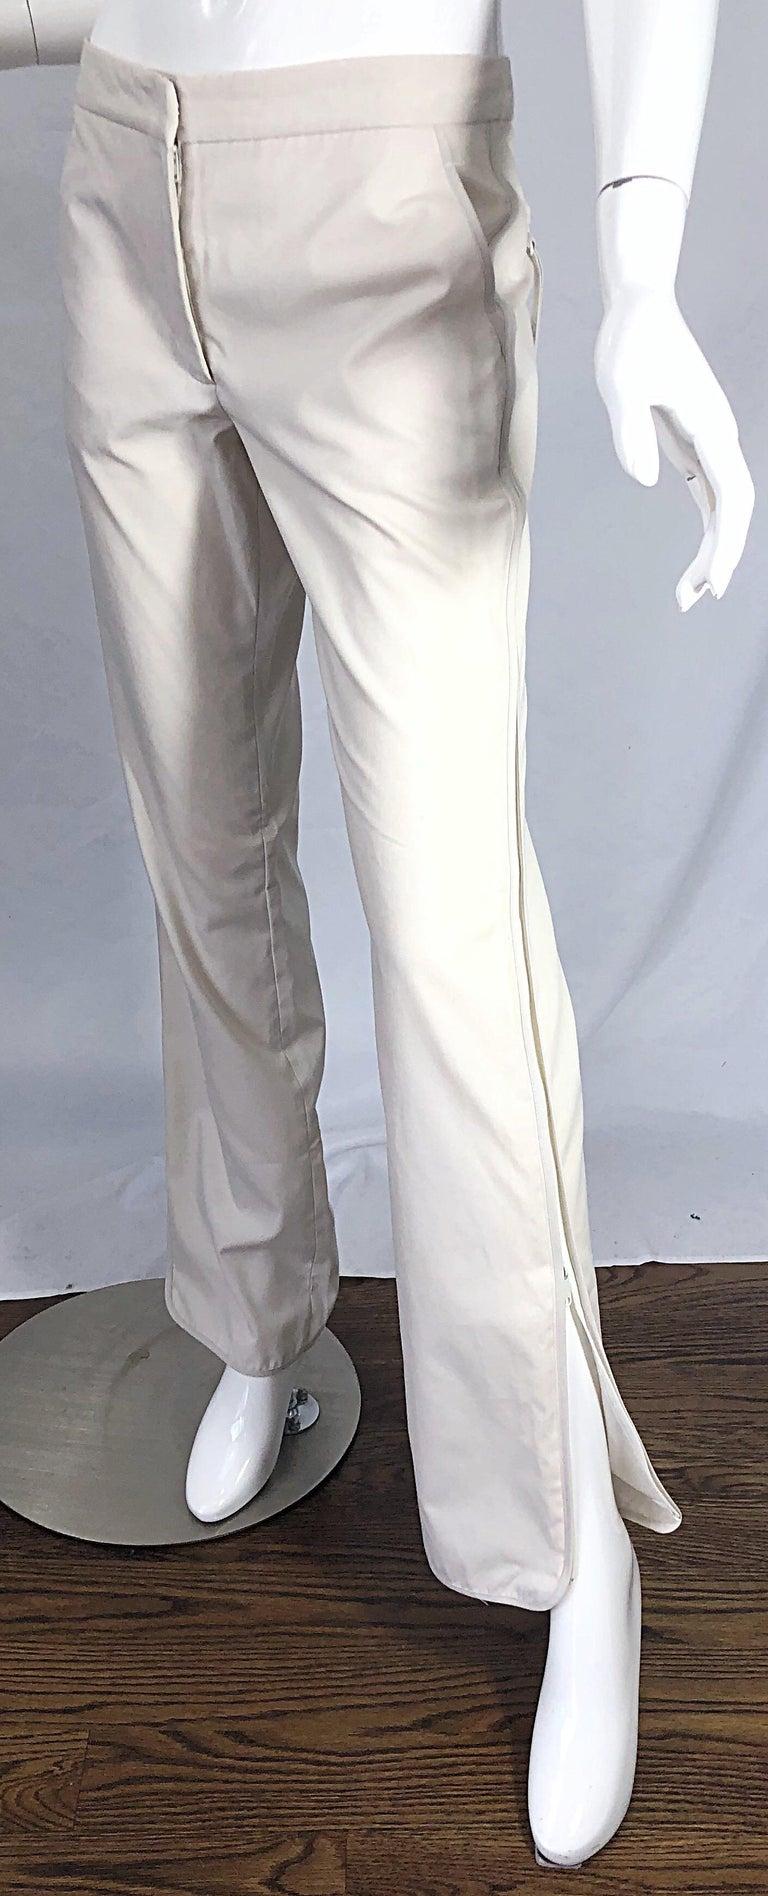 1990s Katayone Adeli Size 6 Zipper Leg Low Rise Stone Khaki Trousers Pants  For Sale 6